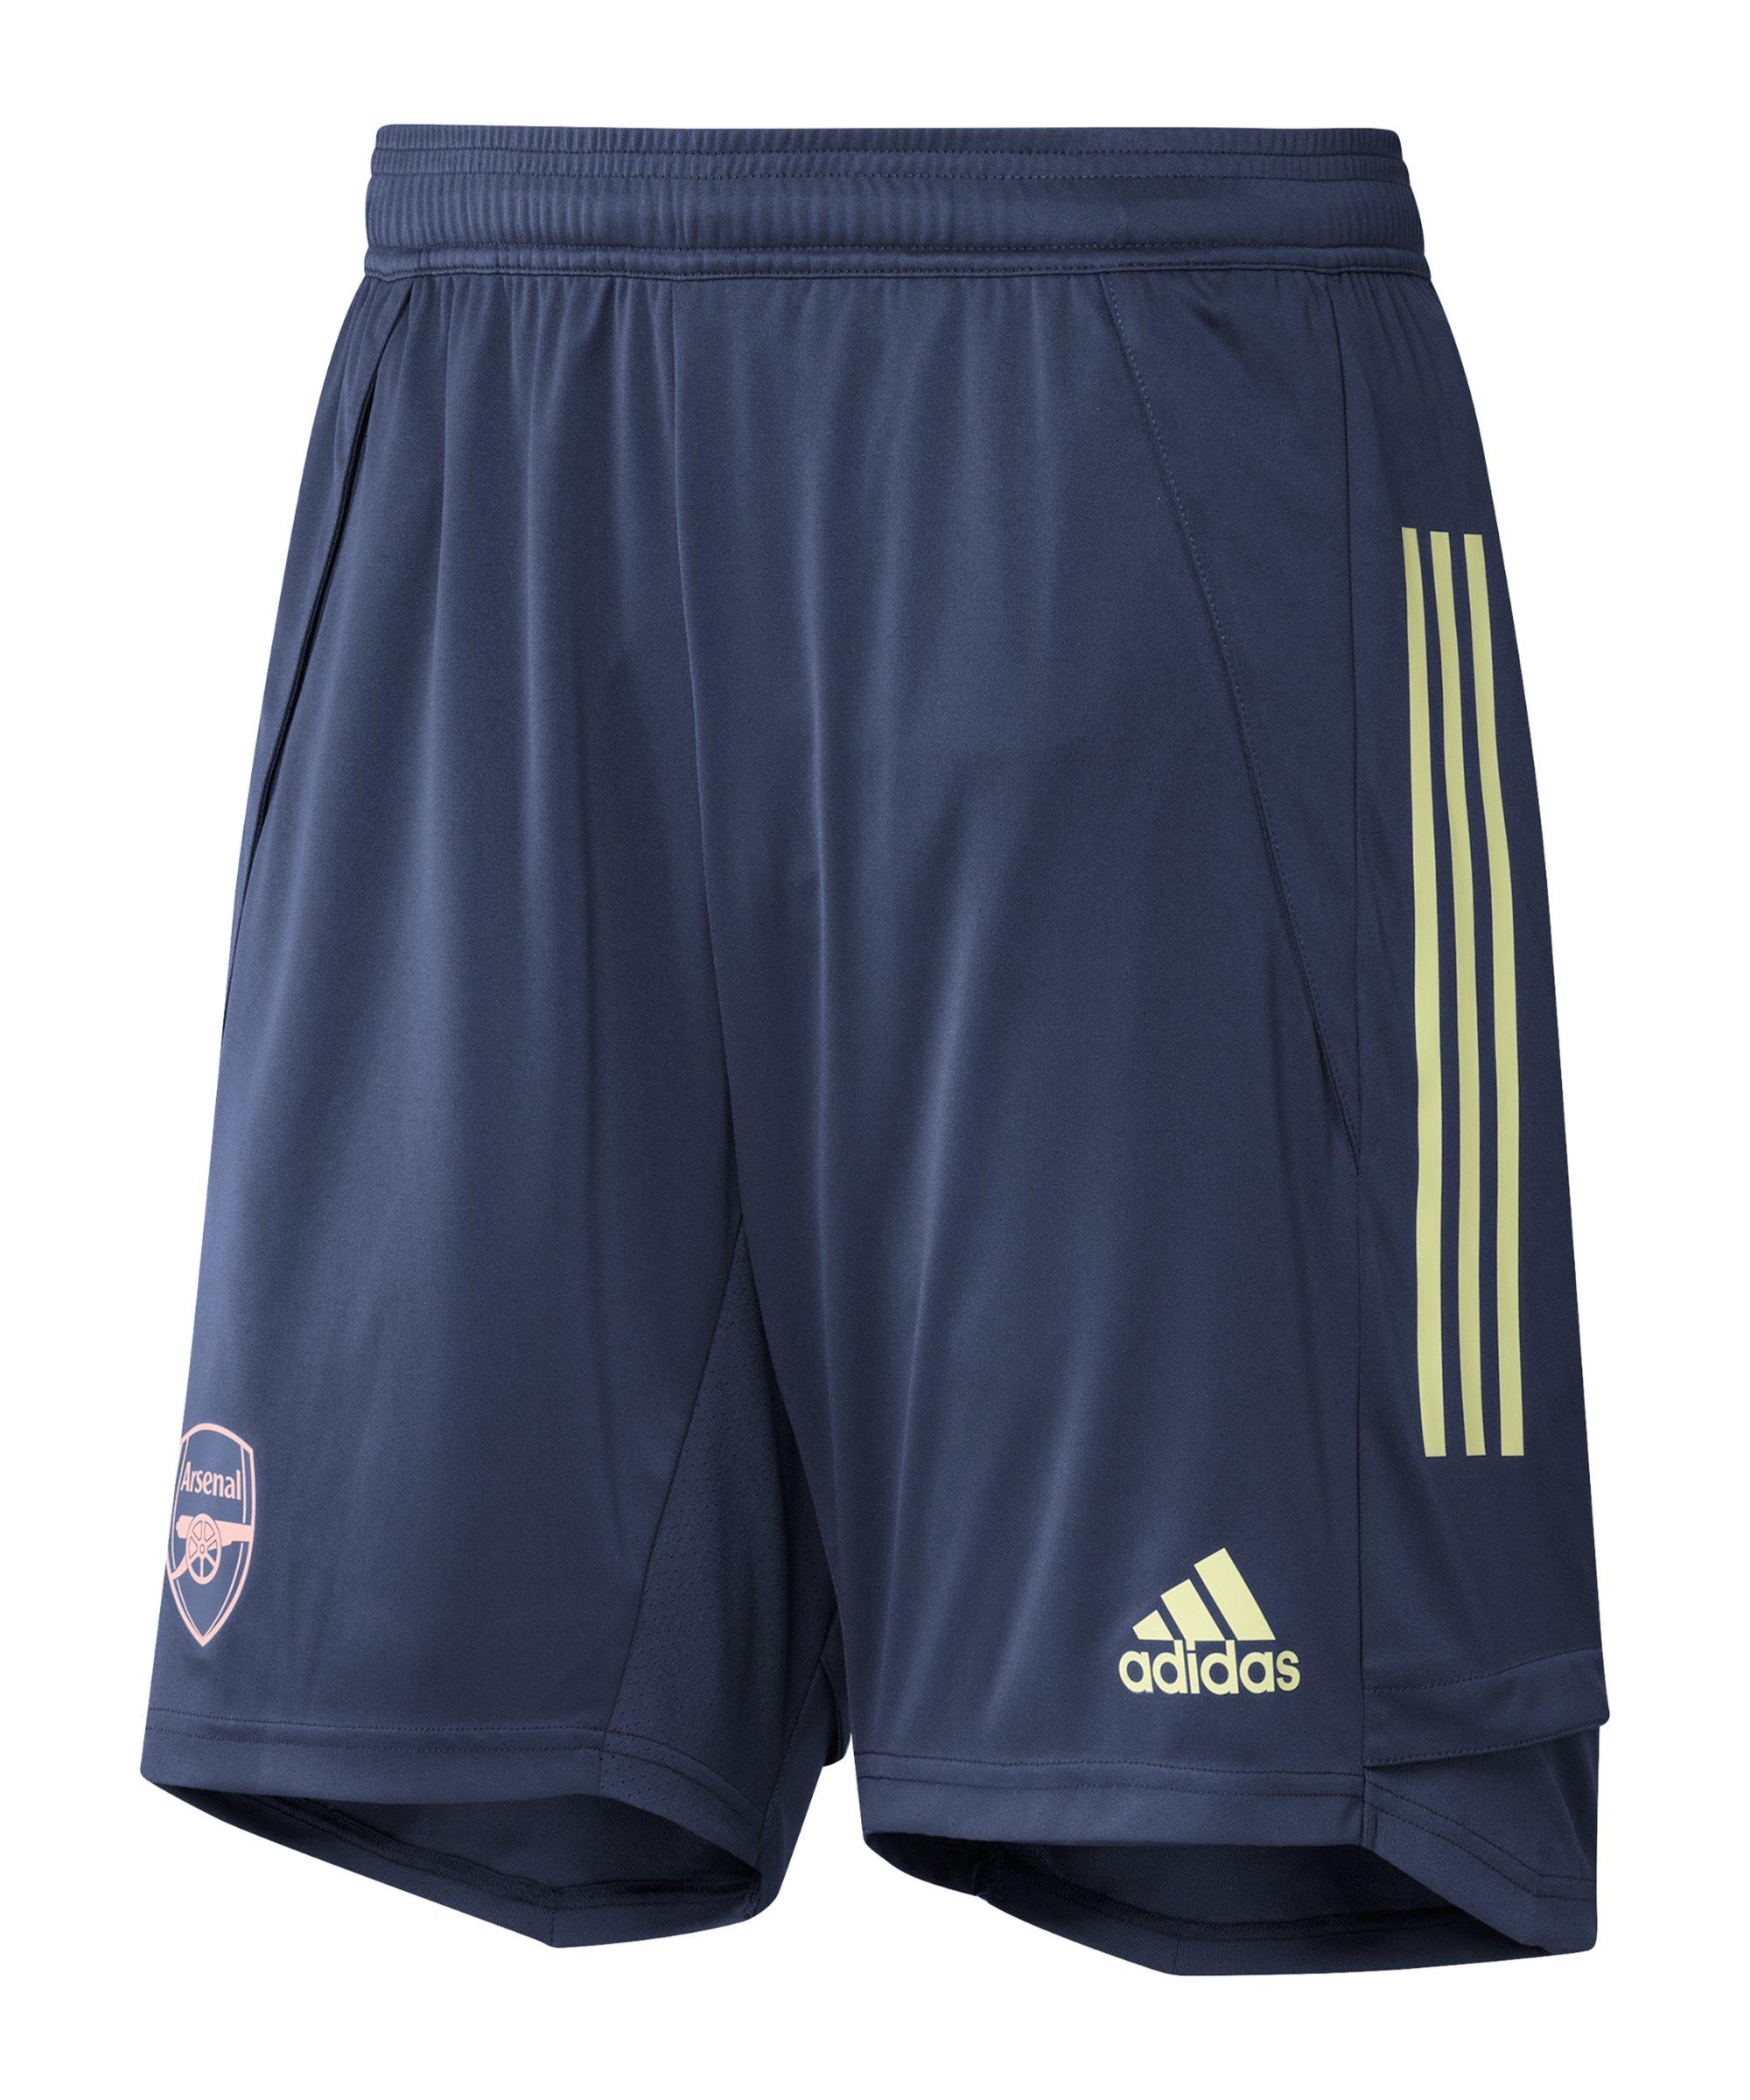 adidas FC Arsenal London Trainingsshort Blau - blau